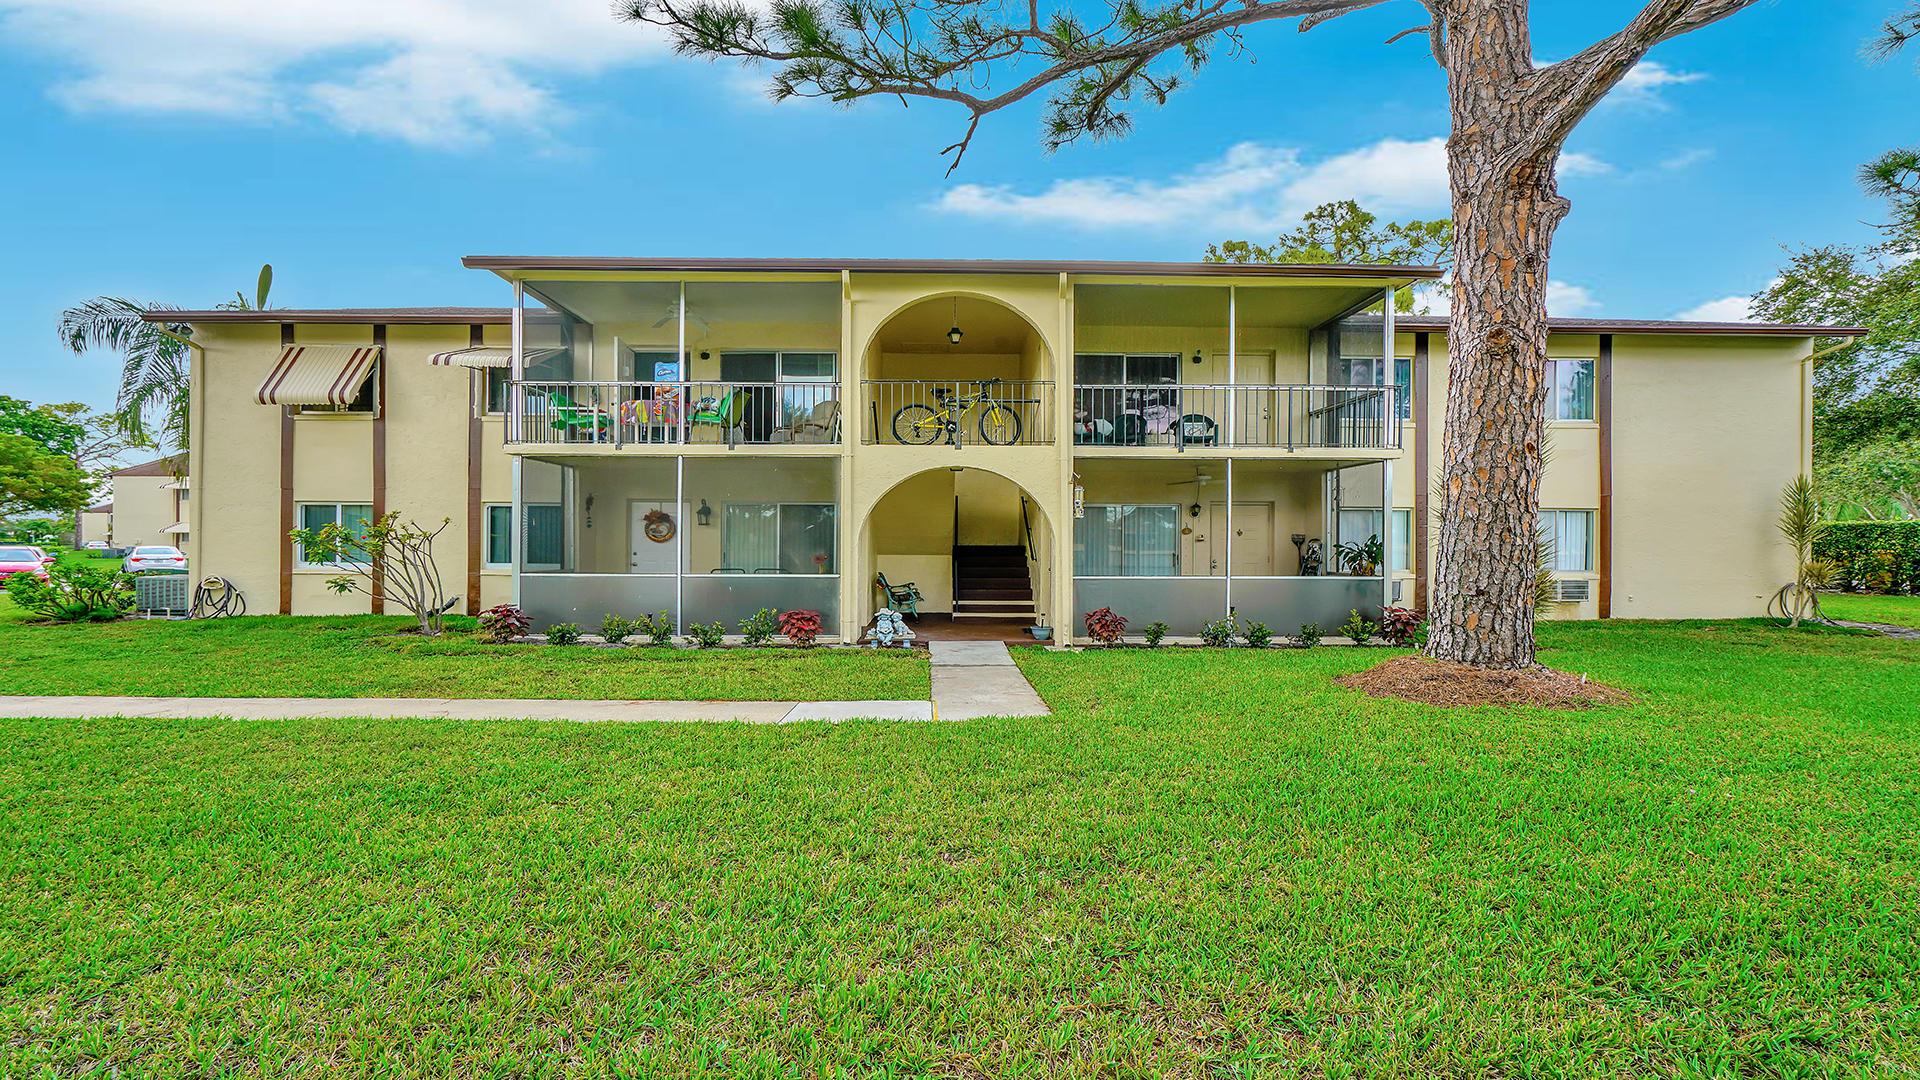 3586 La Playas Court B-1 Greenacres, FL 33463